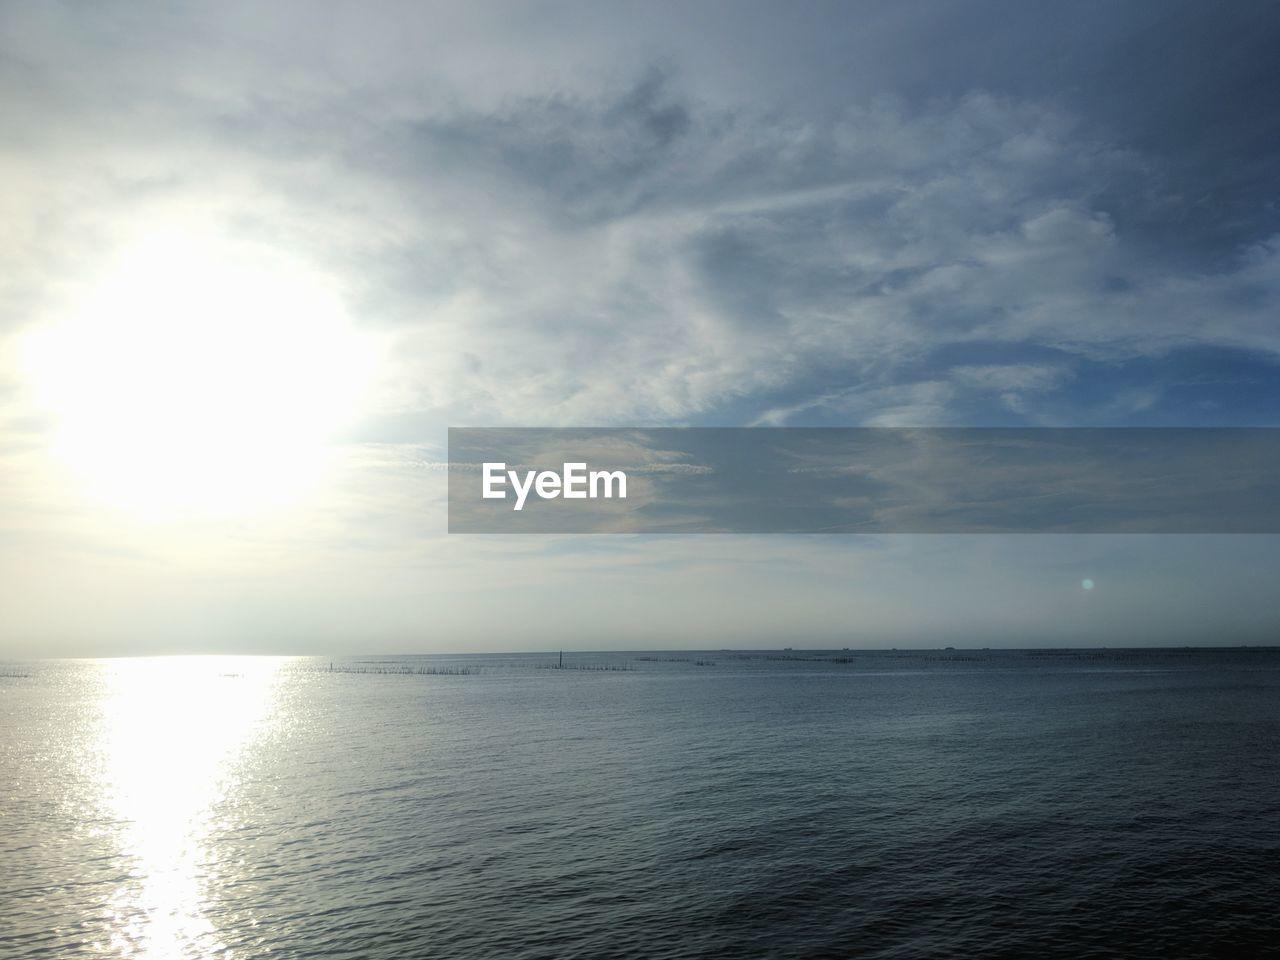 sky, water, sea, horizon, beauty in nature, scenics - nature, tranquility, horizon over water, tranquil scene, cloud - sky, waterfront, idyllic, nature, sunlight, no people, reflection, sun, day, non-urban scene, outdoors